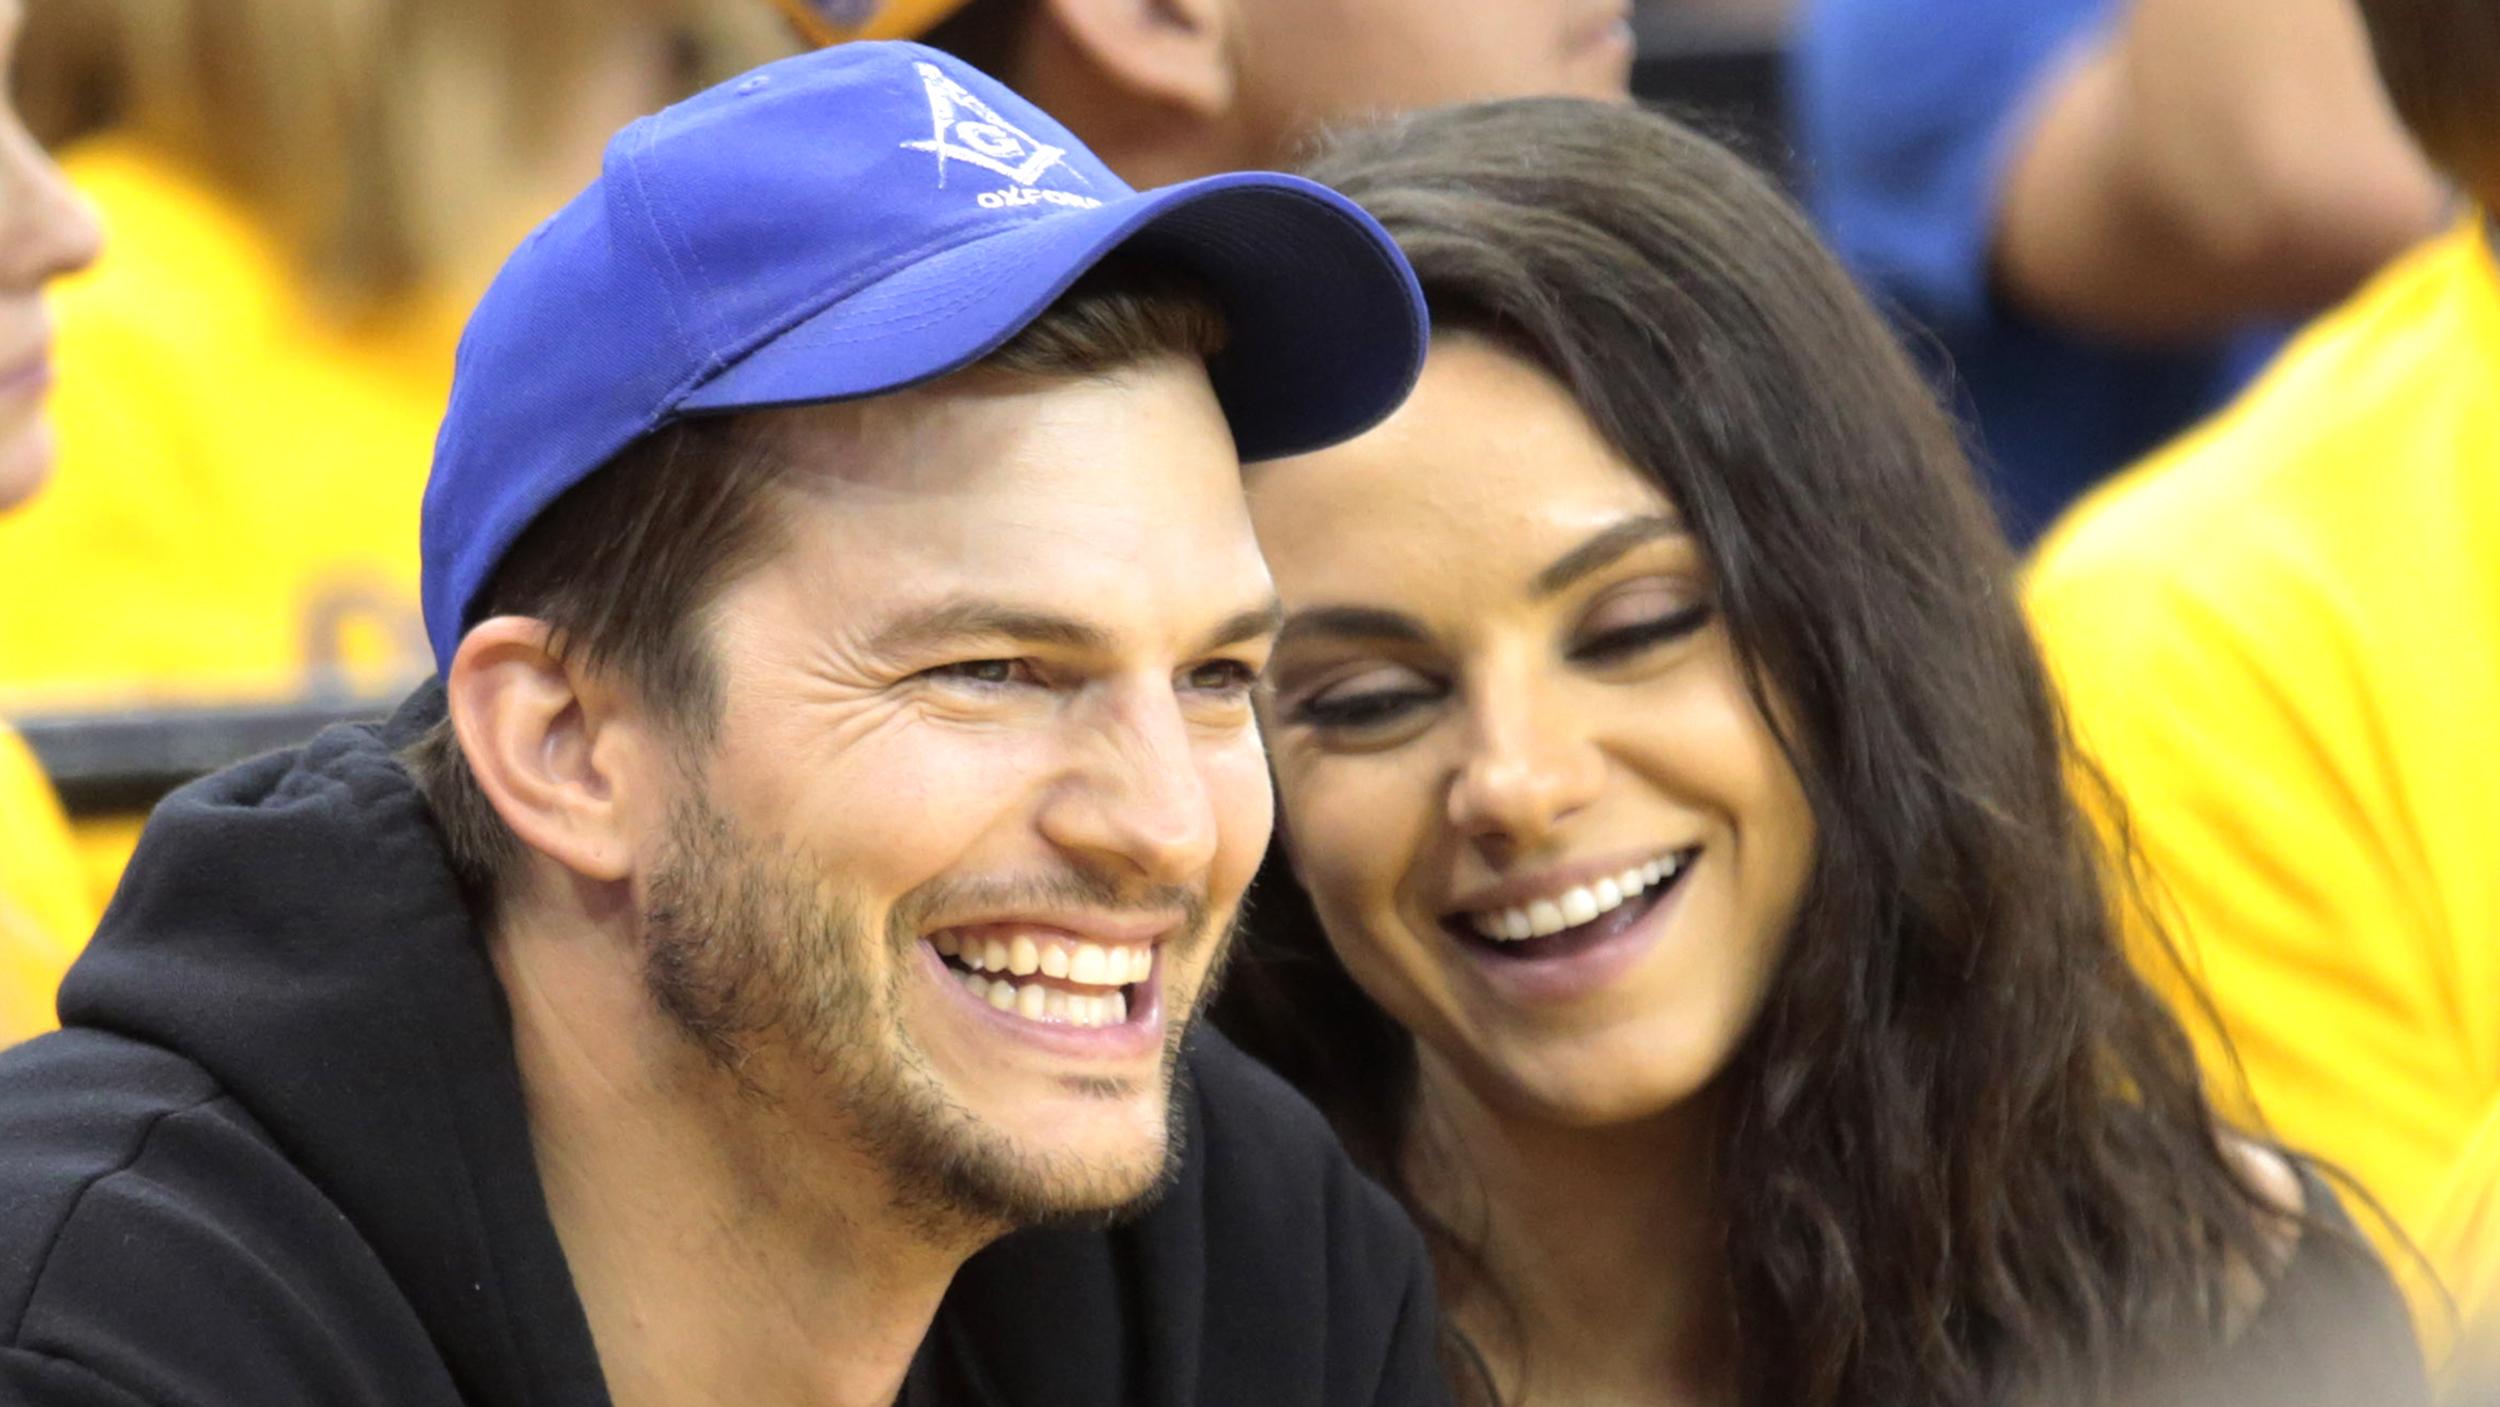 ashton kutcher and mila kunis are expecting baby no 2